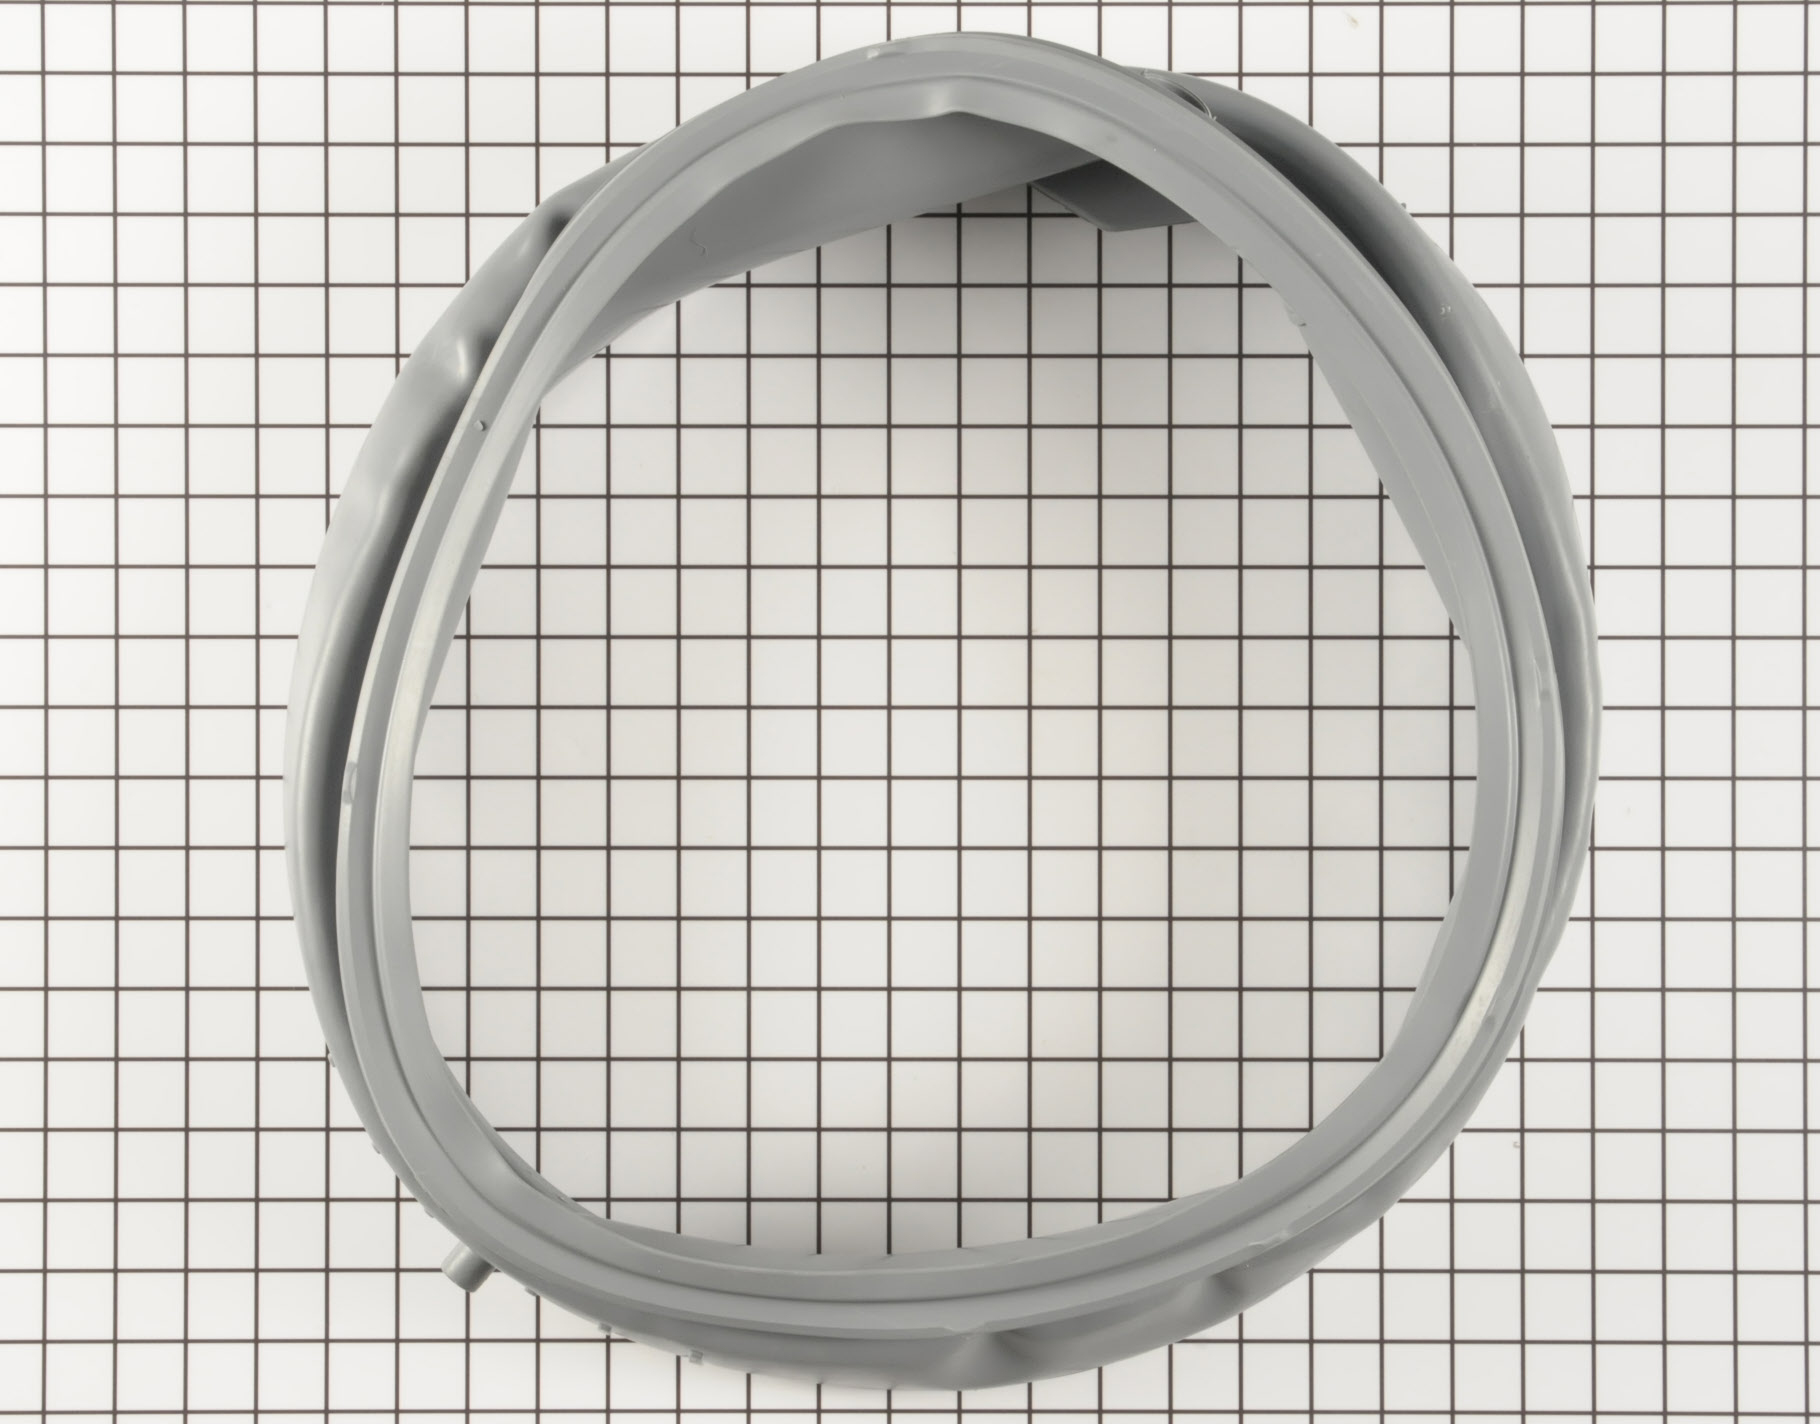 LG Washing Machine Part # 4986ER0004E - Door Boot Seal